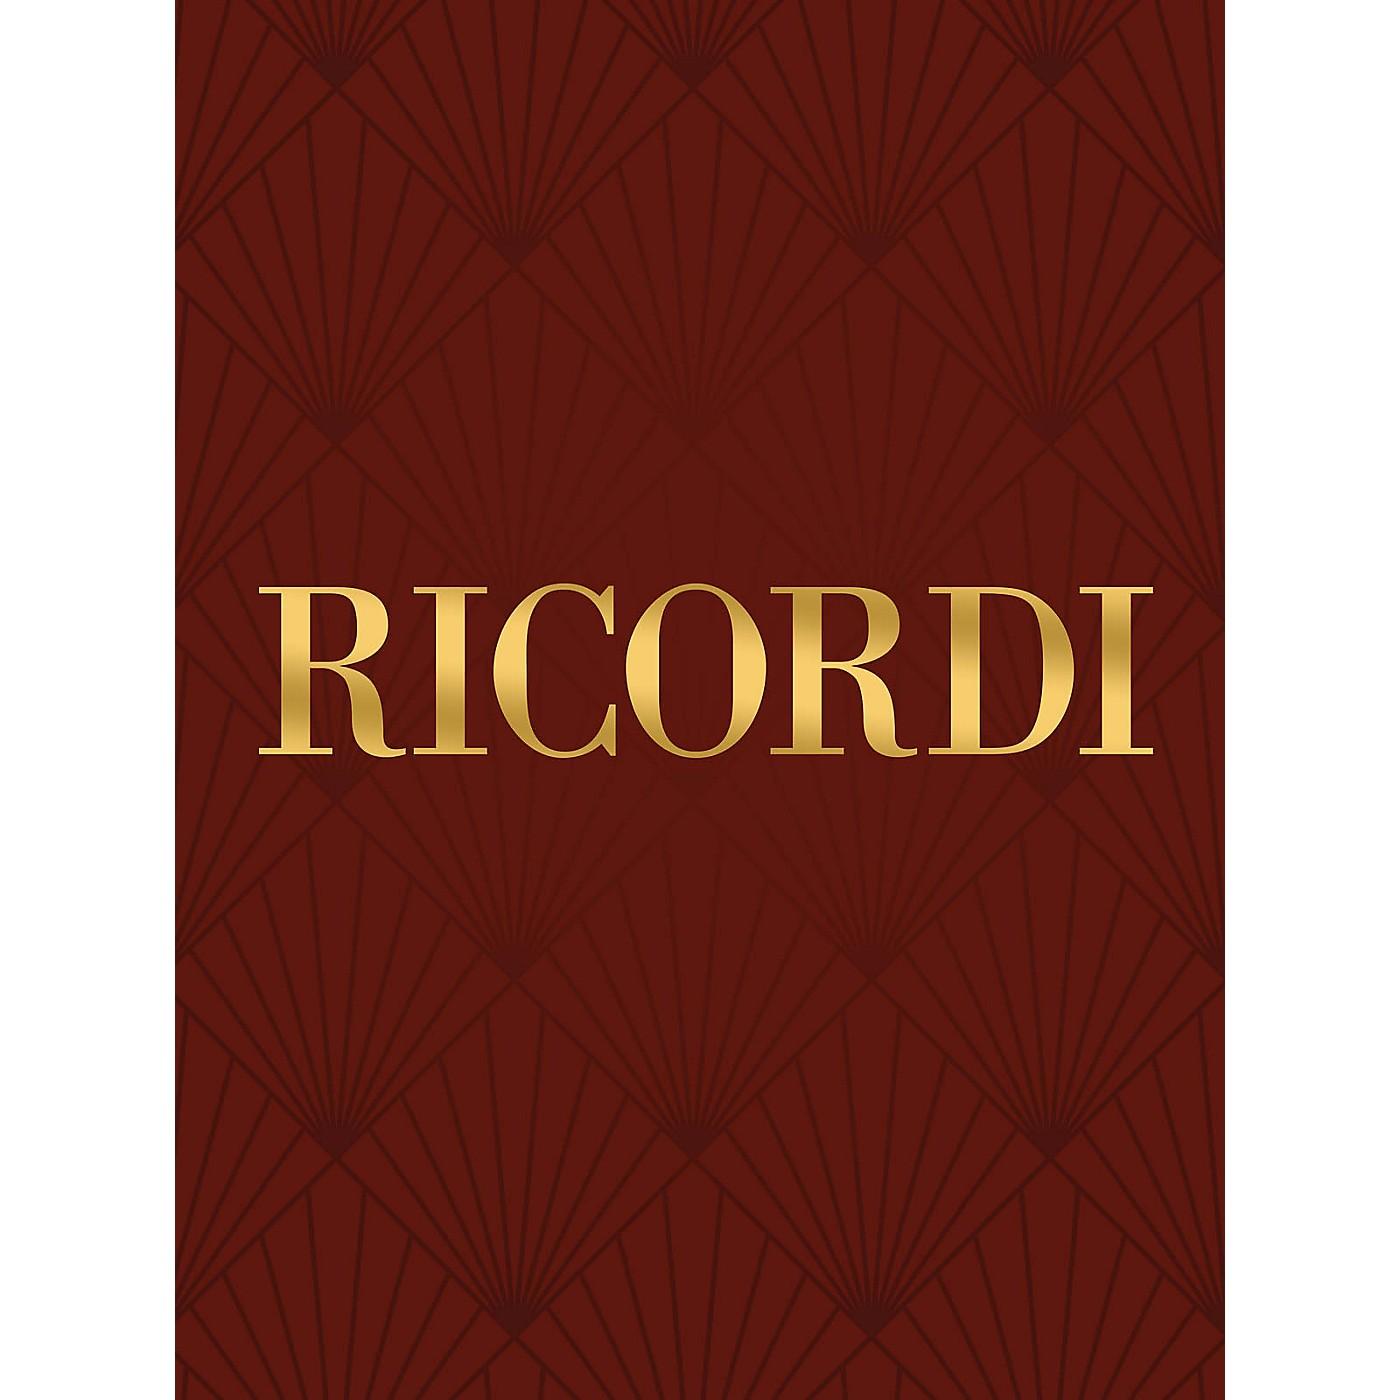 Ricordi Opere complete per clavicembalo - Volume 9 (Complete Works) Piano by Scarlatti Edited by Alessandro Longo thumbnail